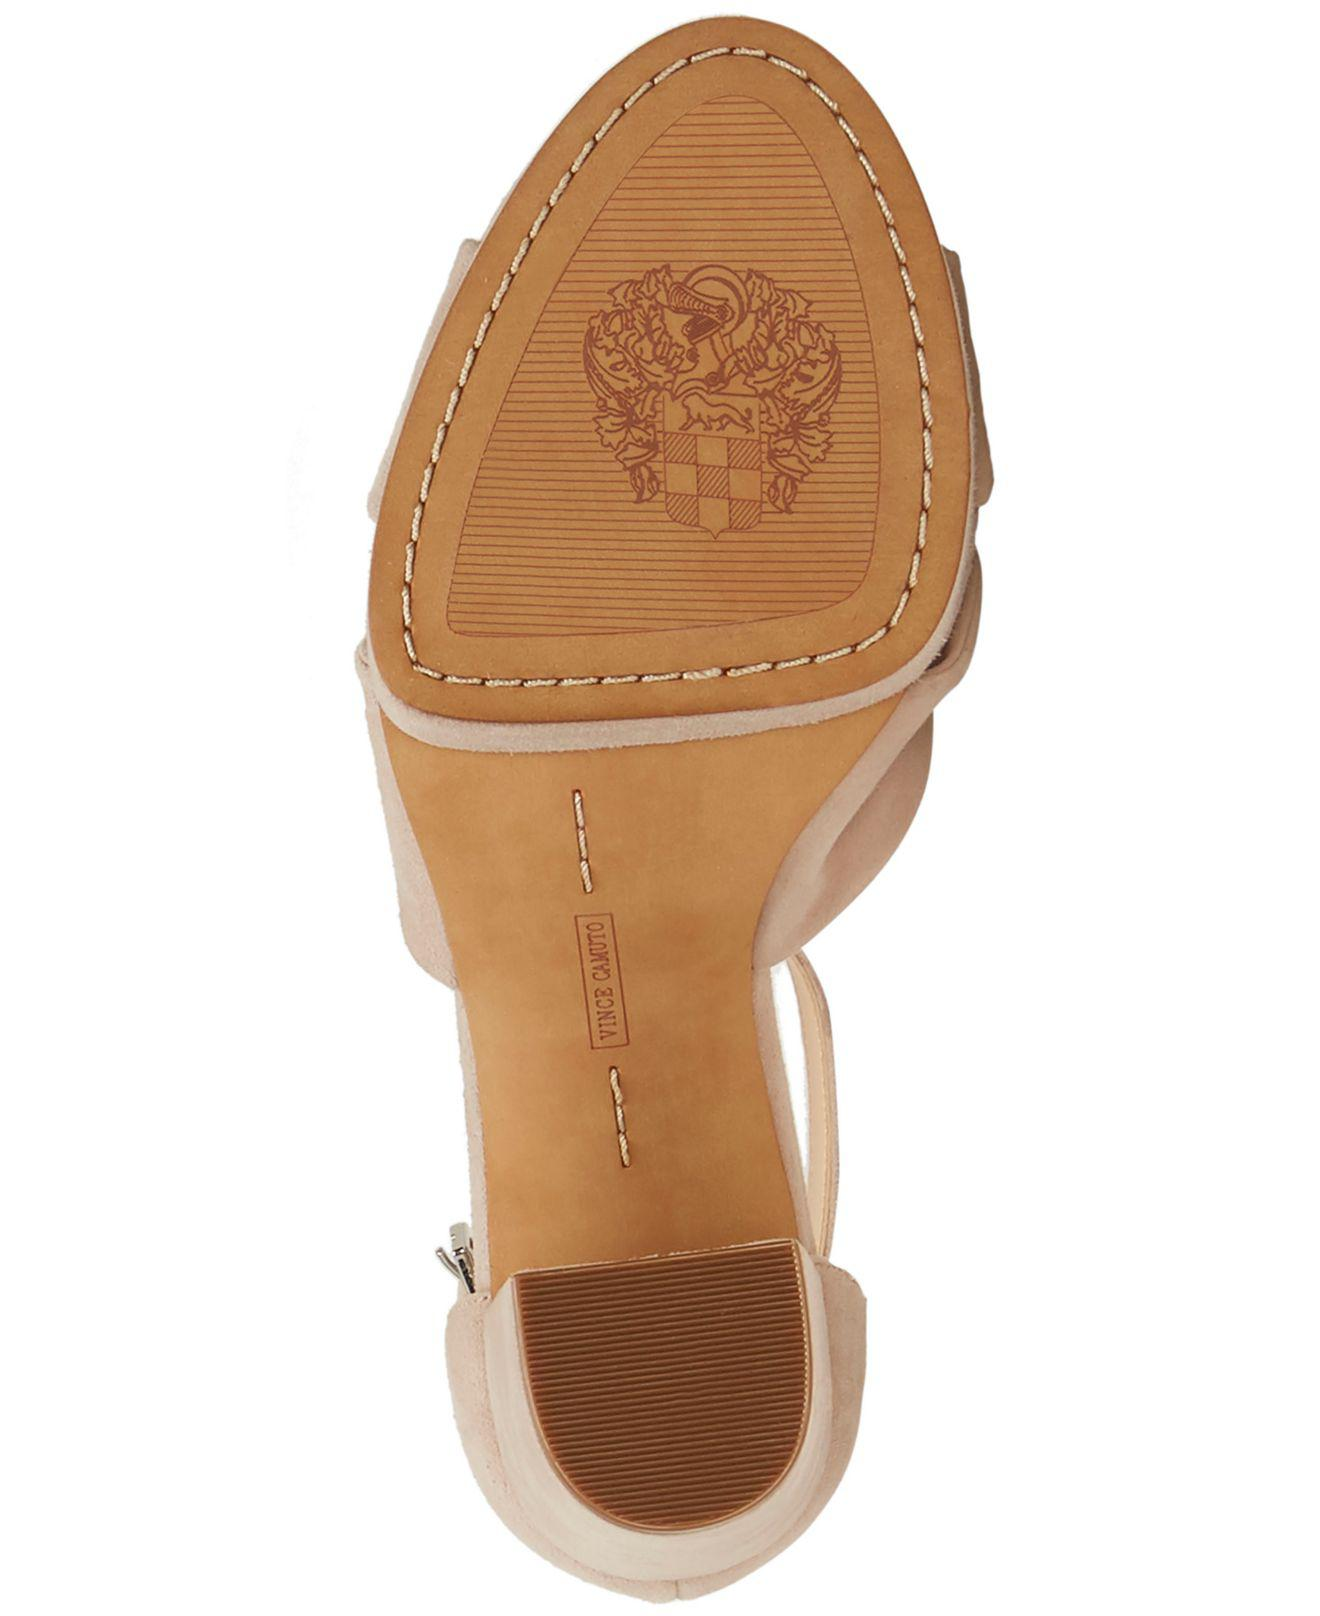 05b6bc8029a8 Lyst - Vince Camuto Corlesta Knotted Platform Dress Sandals